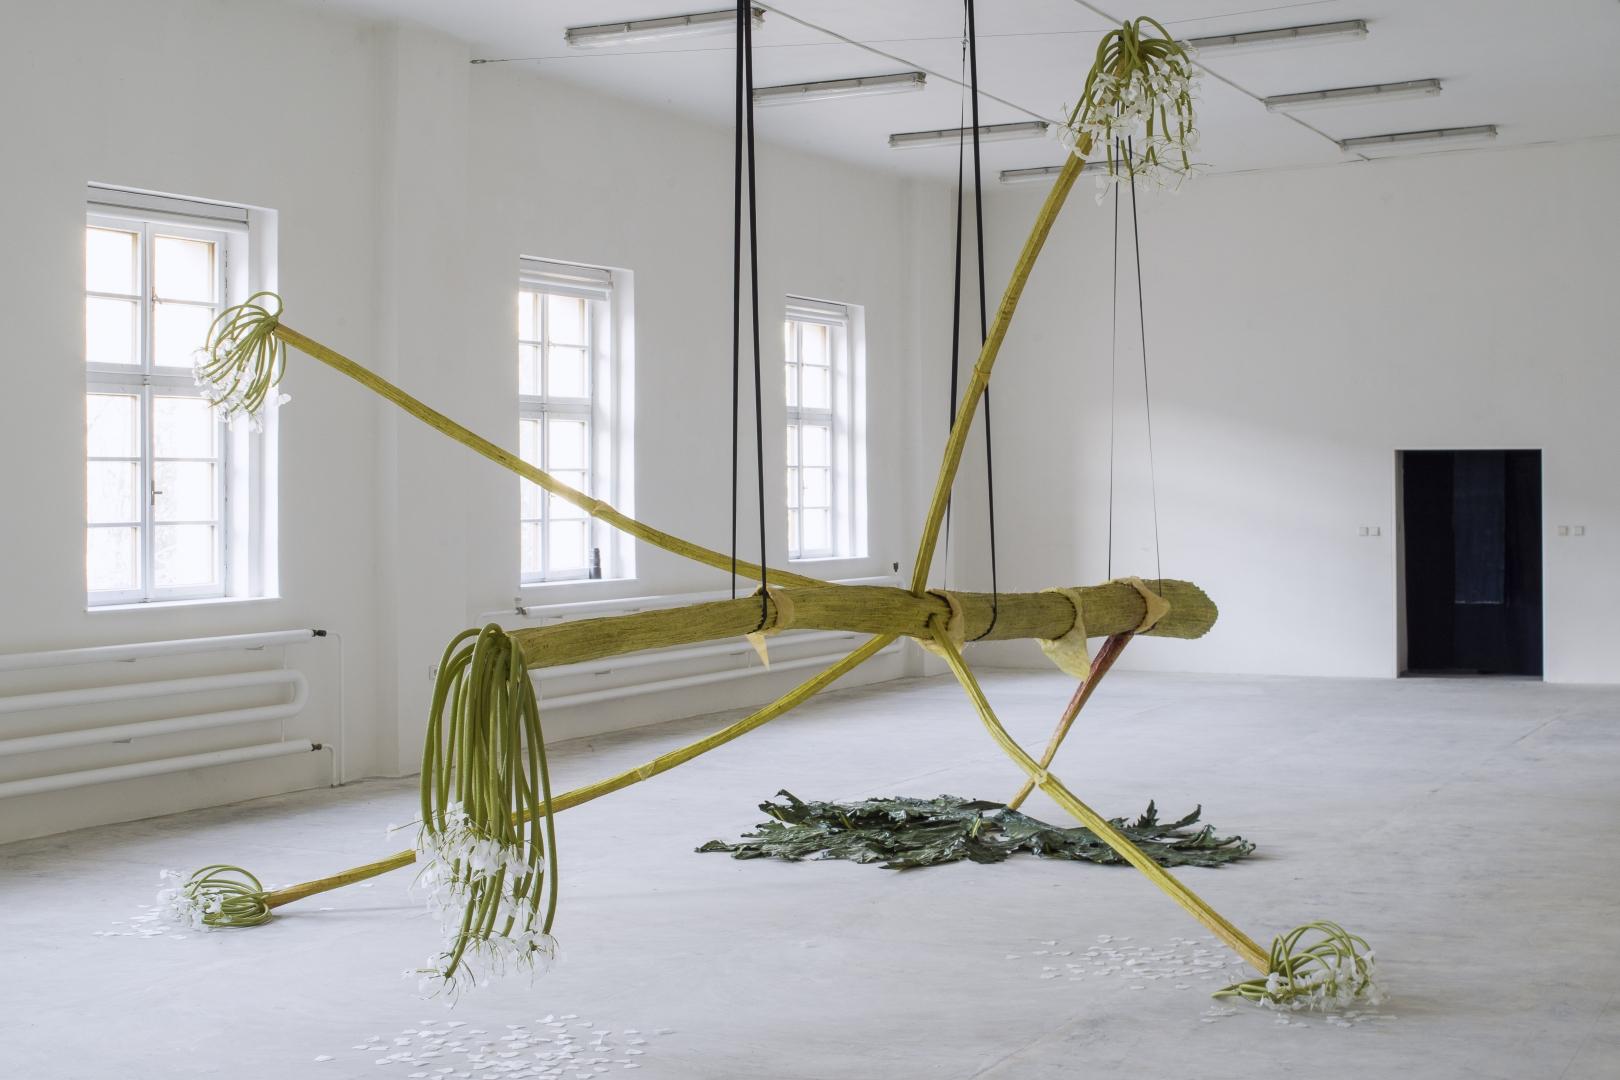 Ingela Ihrman, The Giant Hogweed, Karlin studios, Prague, Borbala Soos